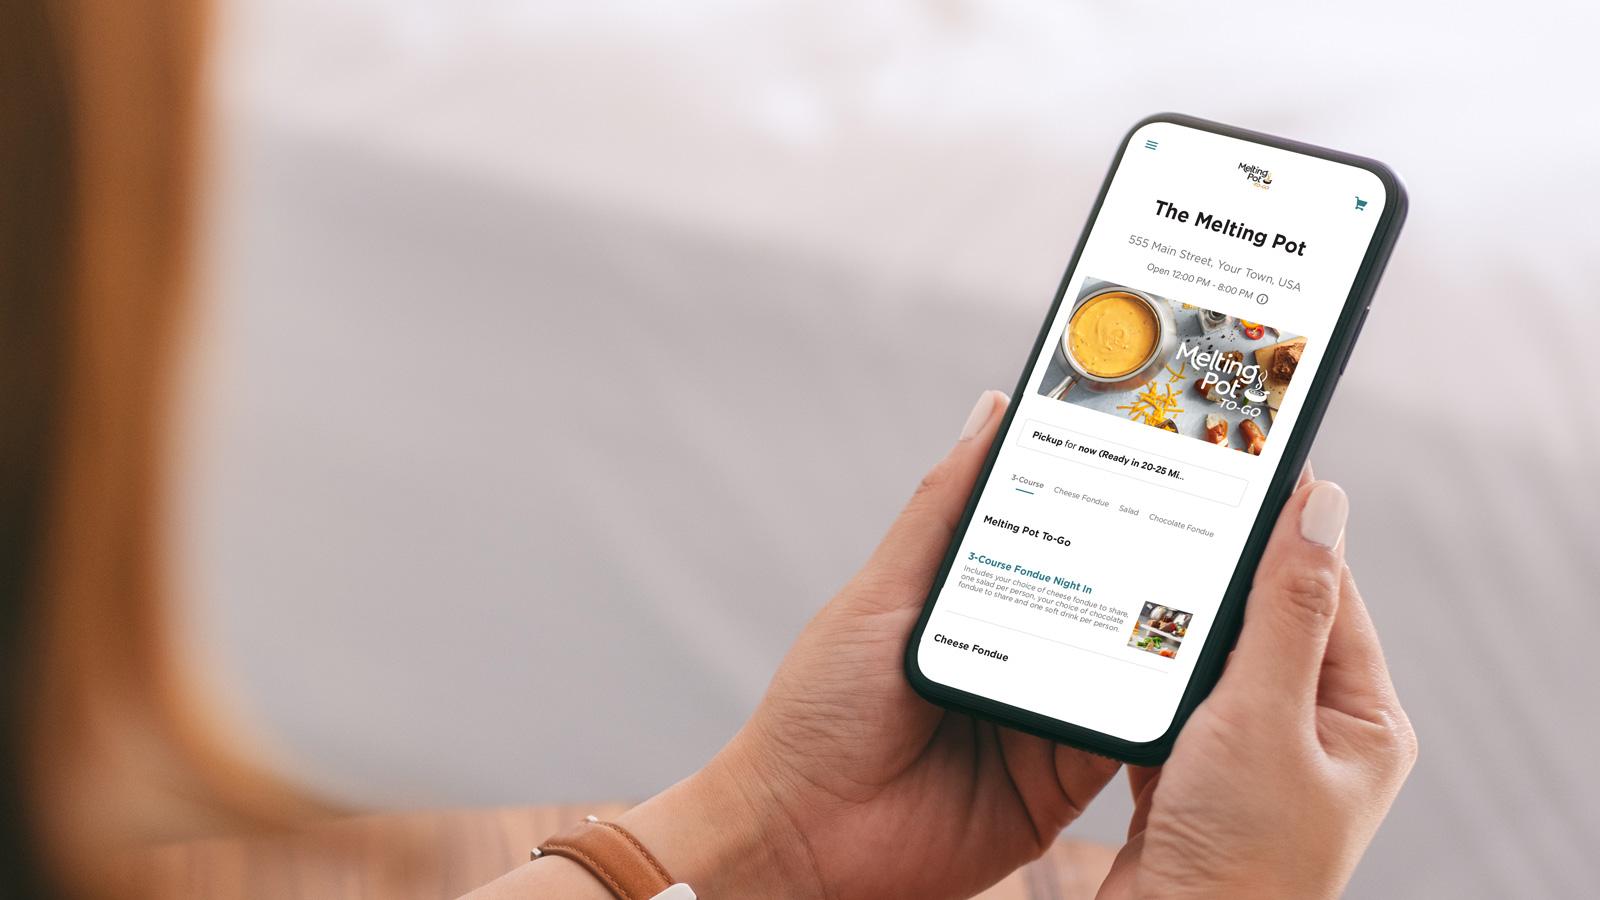 Ordering Melting Pot Take-Out Online